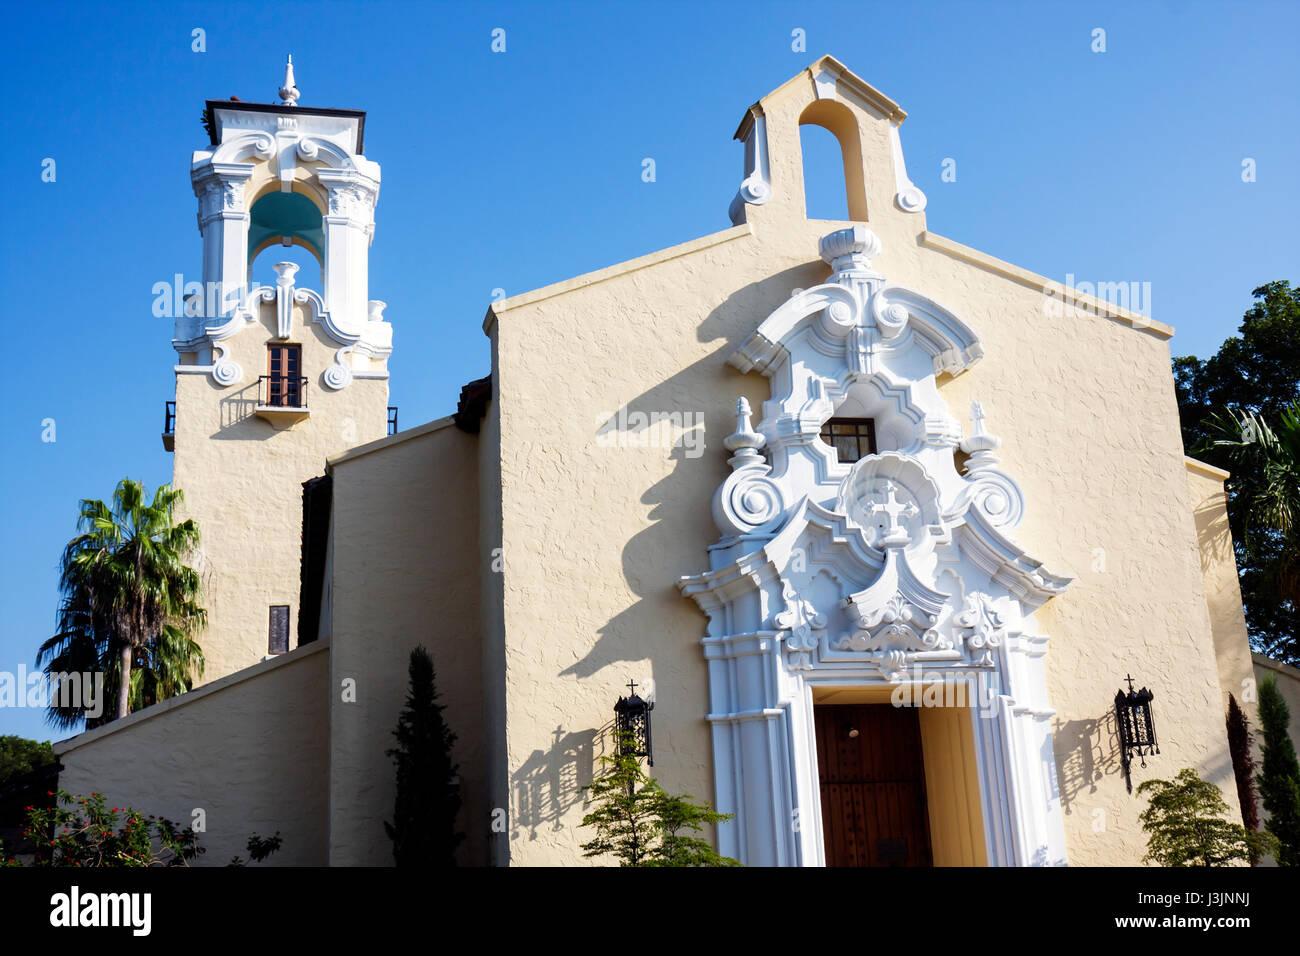 Miami Coral Gables Florida Congregational Church 1925 Spanish Baroque Style Protestant Religion Ornamental Architecture Entrance